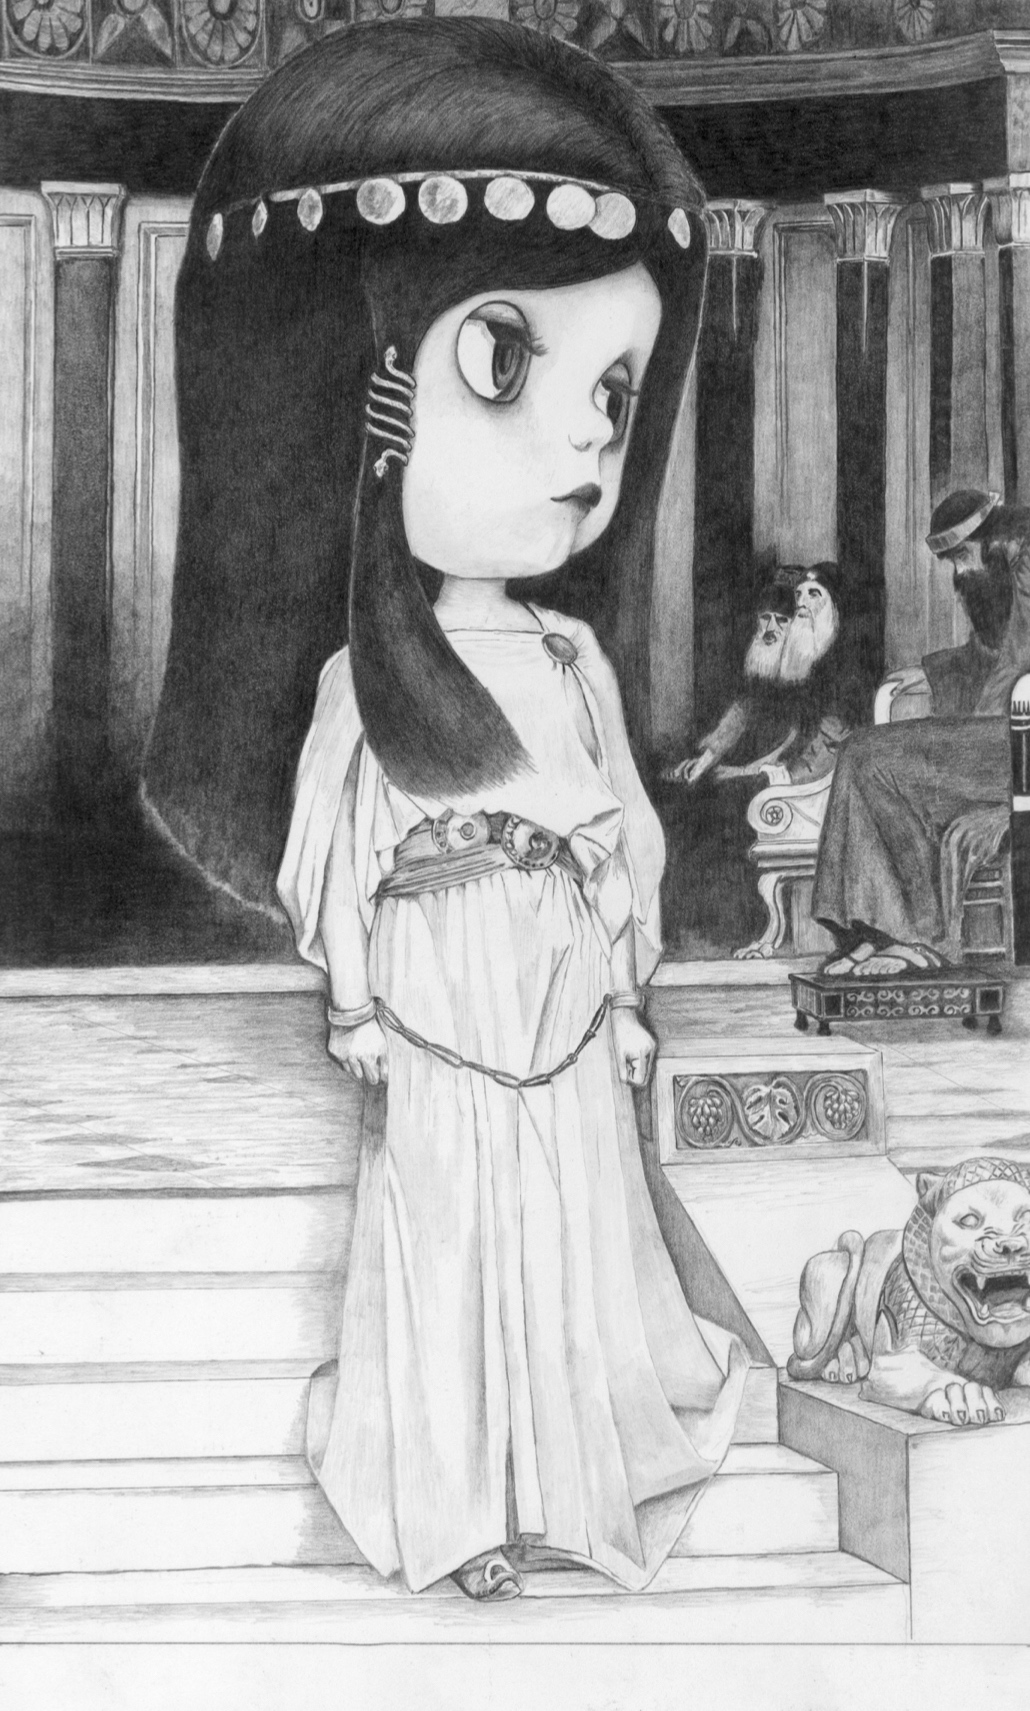 #20 - Blythe Mariamne